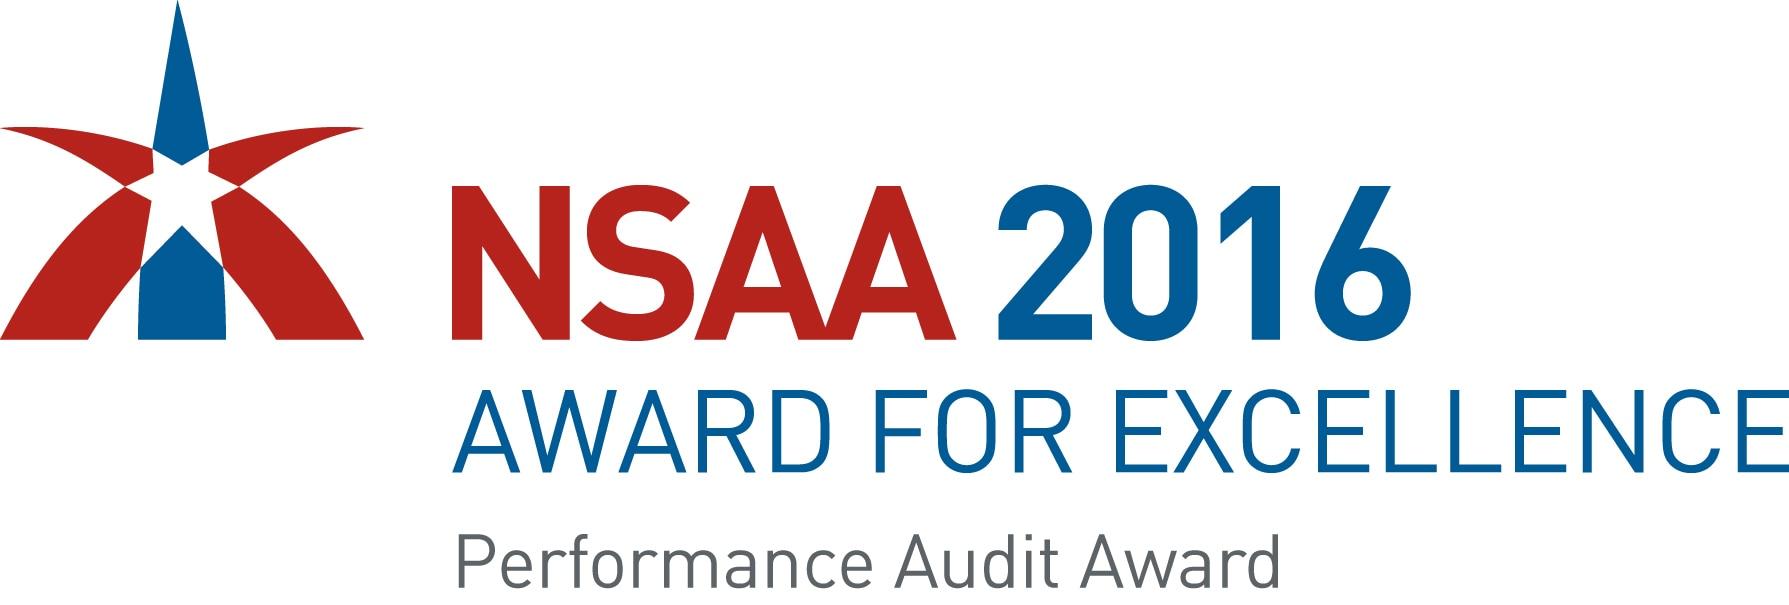 2016 NSAA Award for Excellence Logo